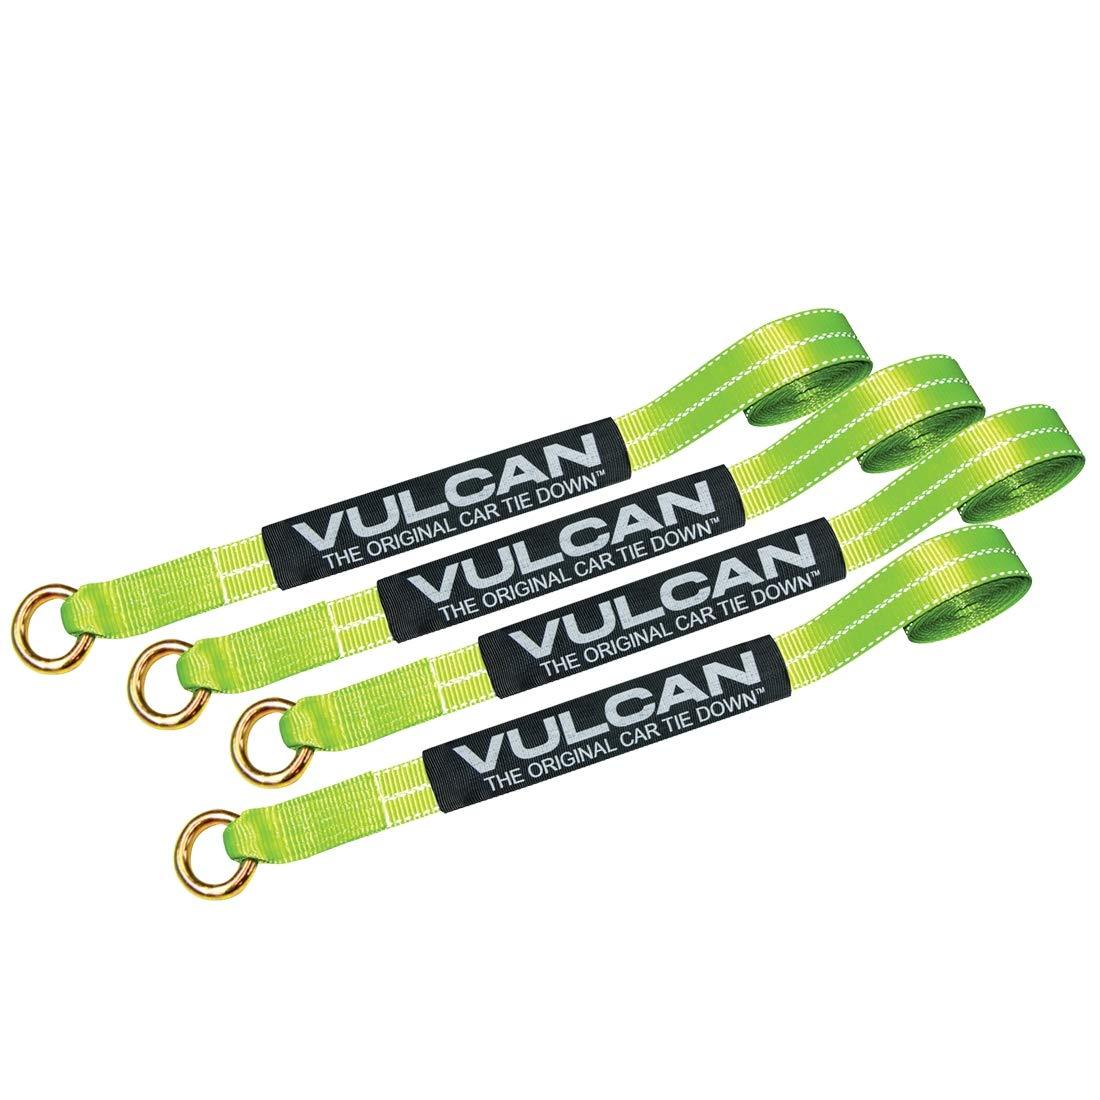 Vulcan Exotic Loop Style Auto Tie Down System (Hi Viz Lime Green)